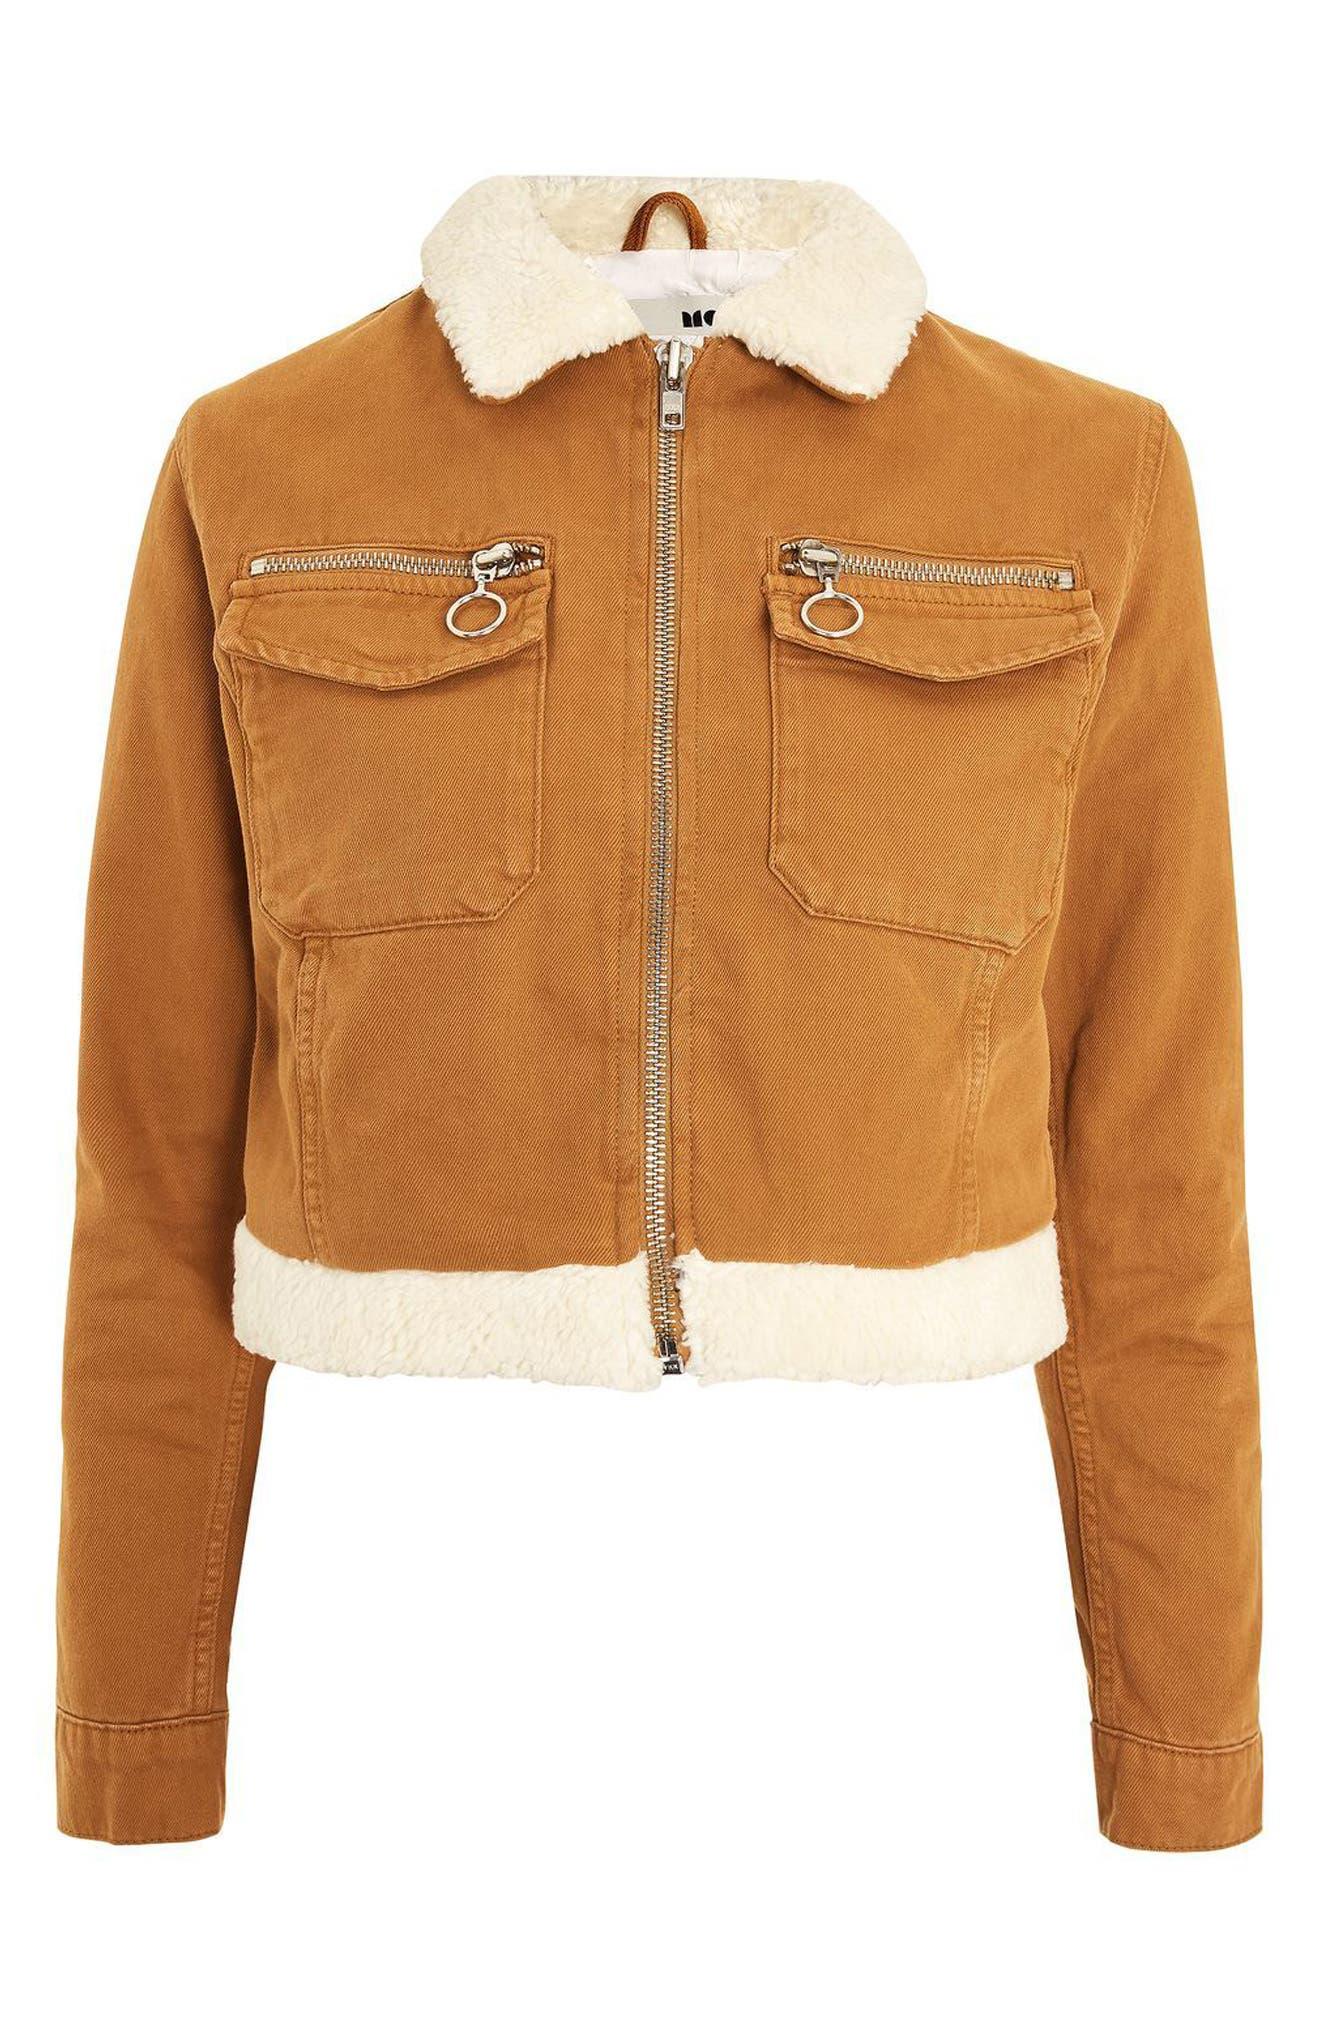 Borg Trim Crop Denim Jacket,                             Alternate thumbnail 4, color,                             210